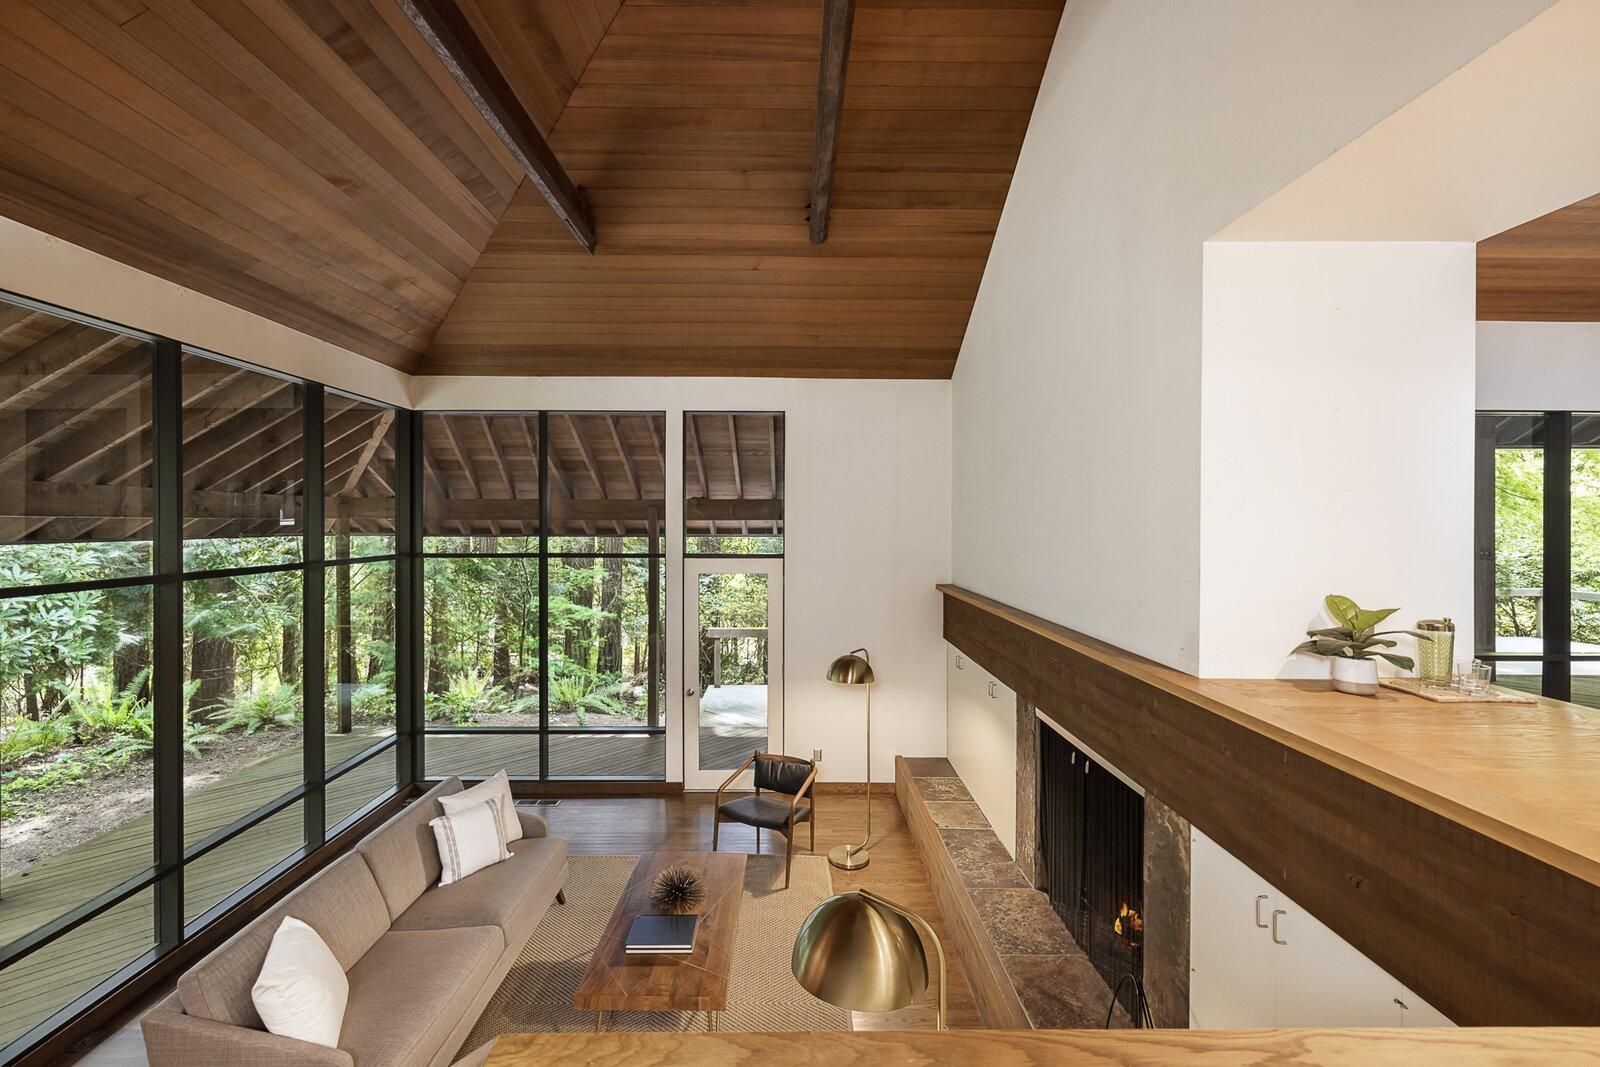 Living room of the Mason Residence by Saul Zaik